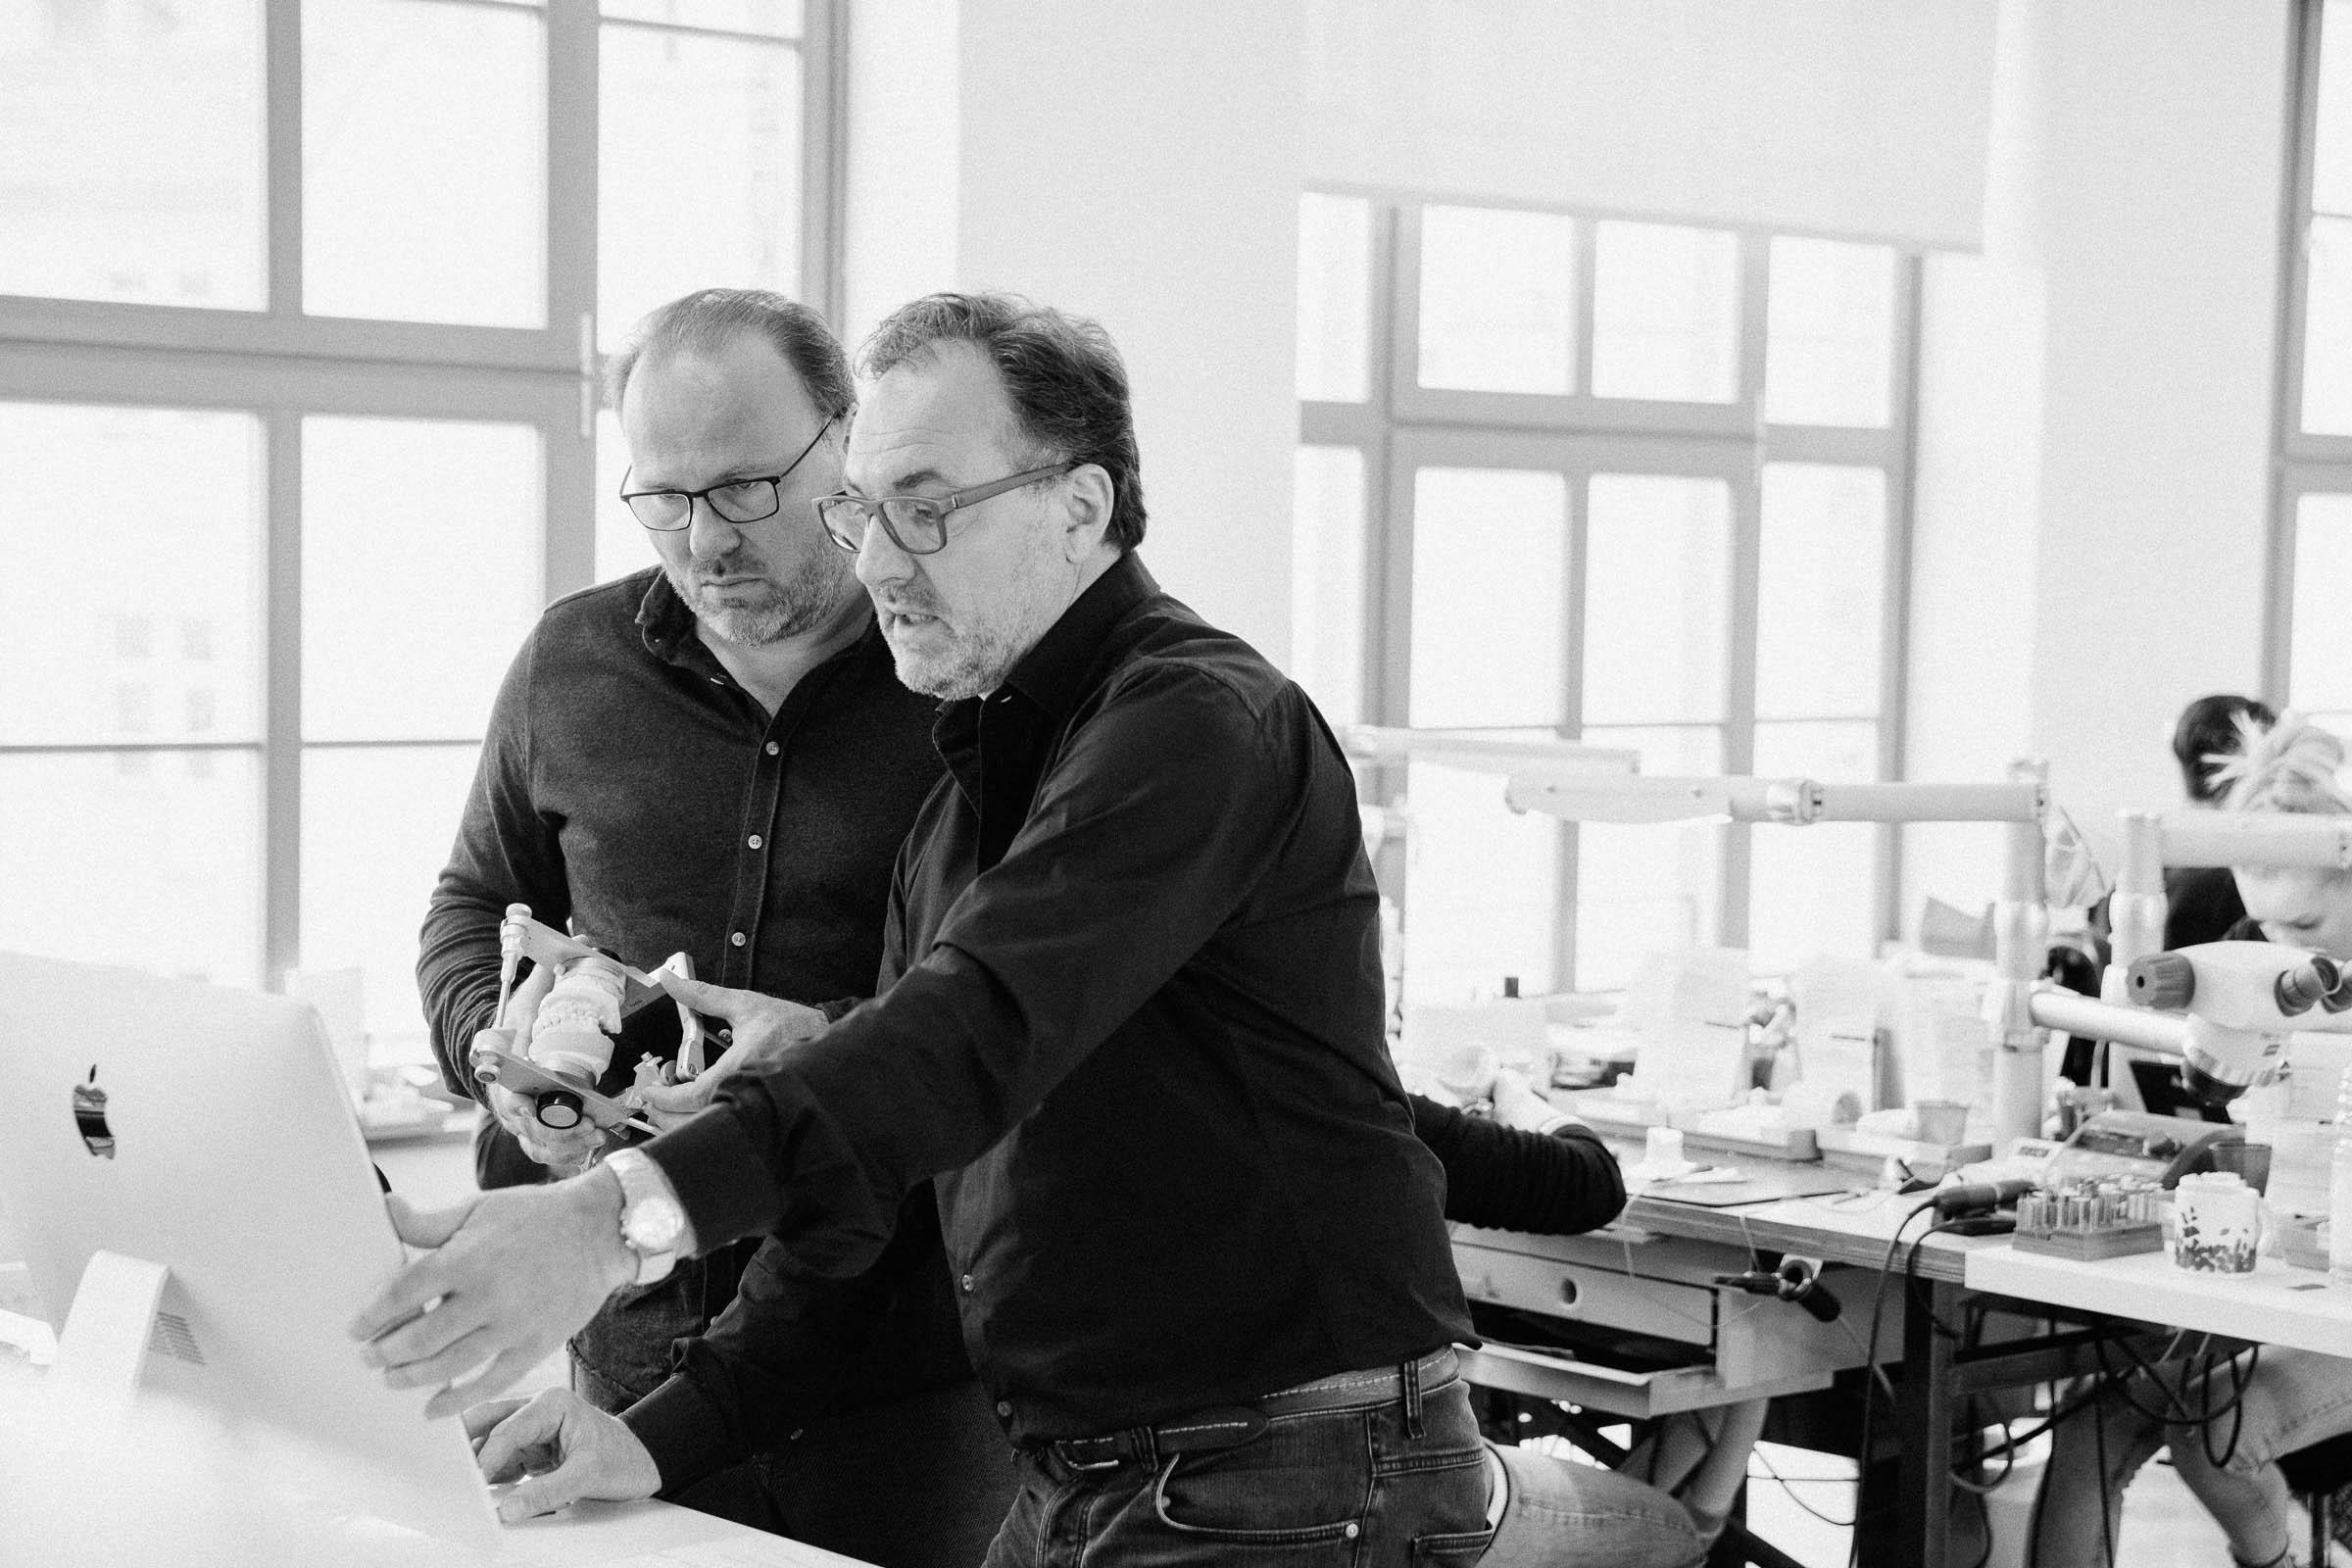 André und Ralf Barsties